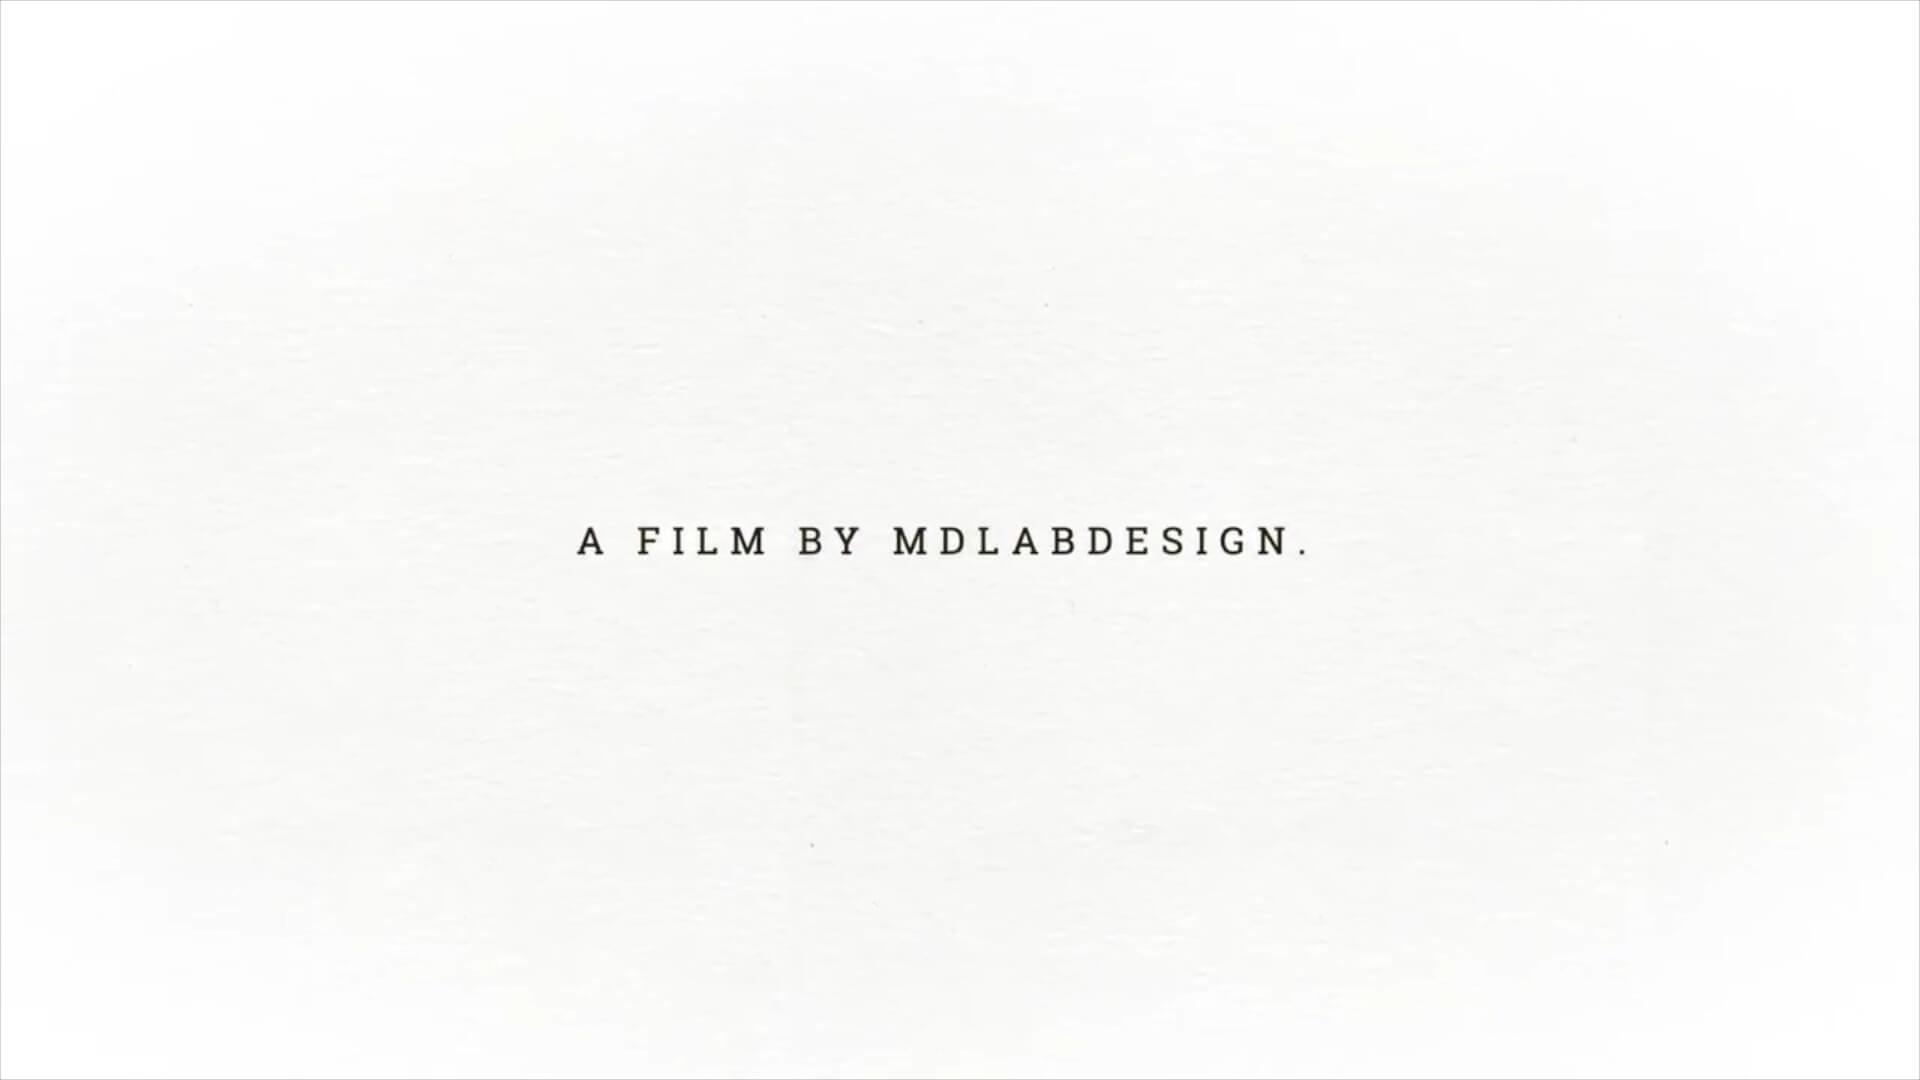 Fcpx主题插件 电影开场序幕演职人员故事梗概模板 Cinematic titles